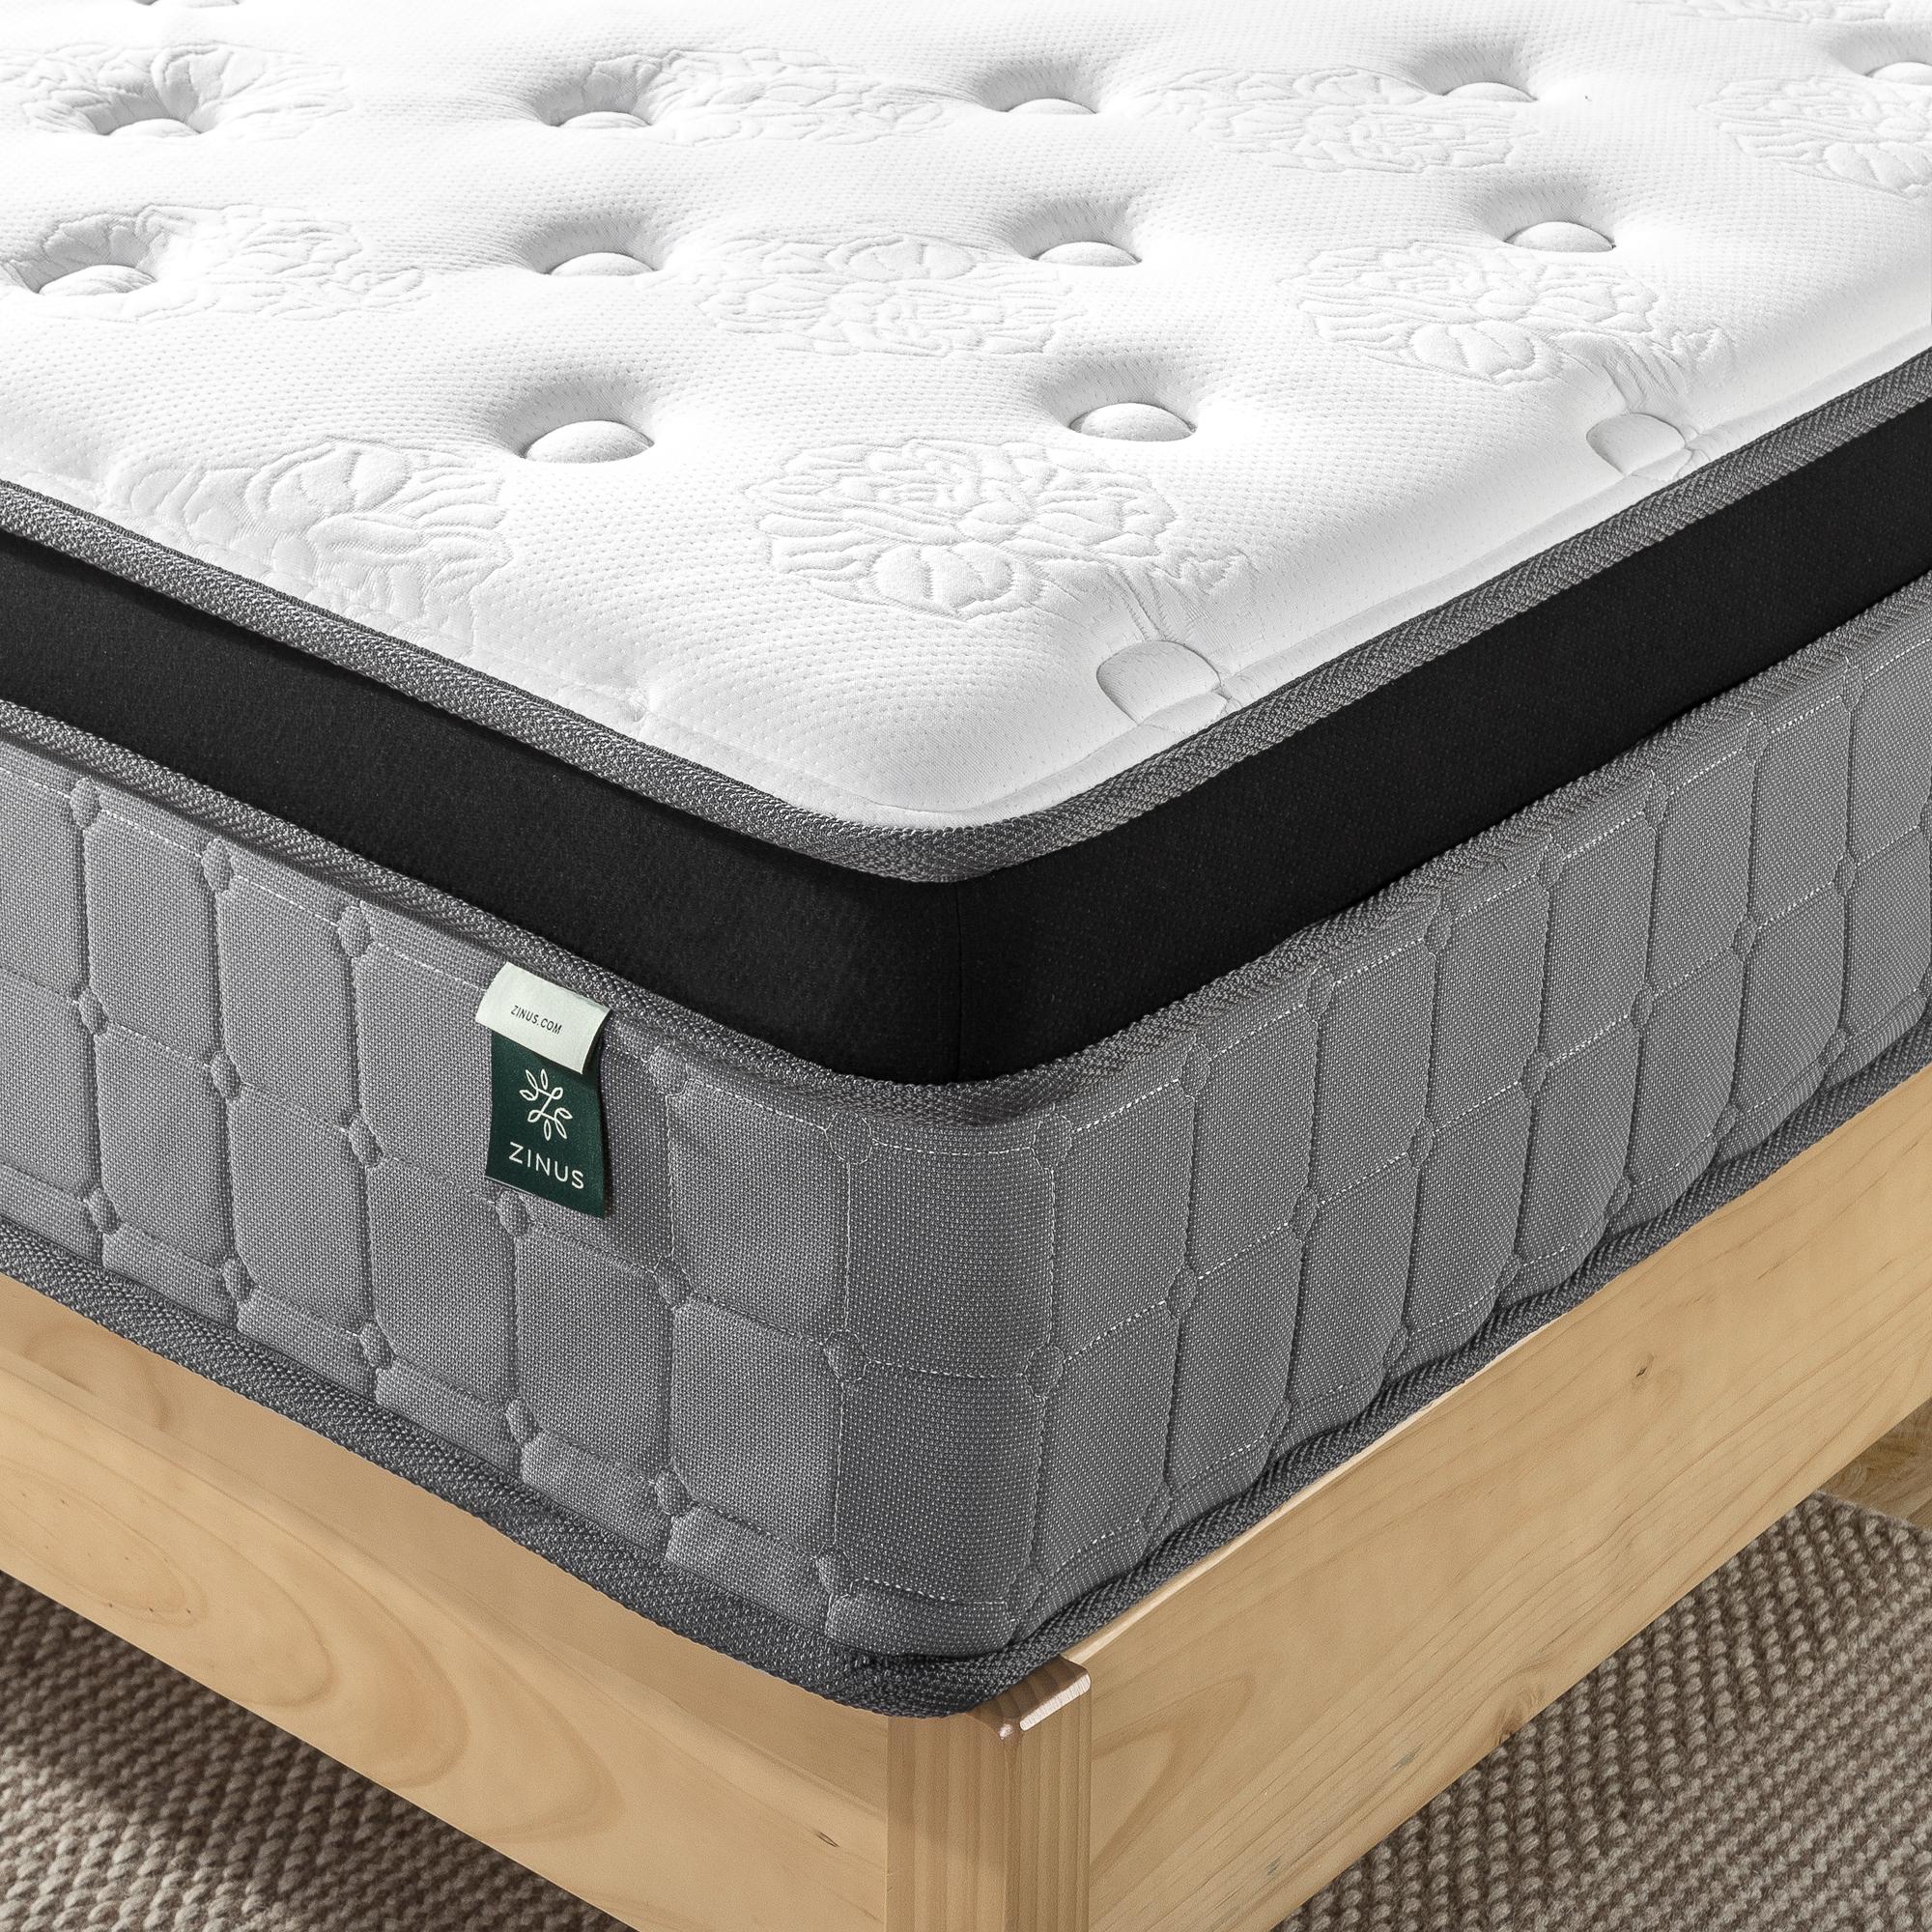 thumbnail 47 - Zinus Mattress Queen Double King Single Bed Memory Foam Pocket Spring Hybrid